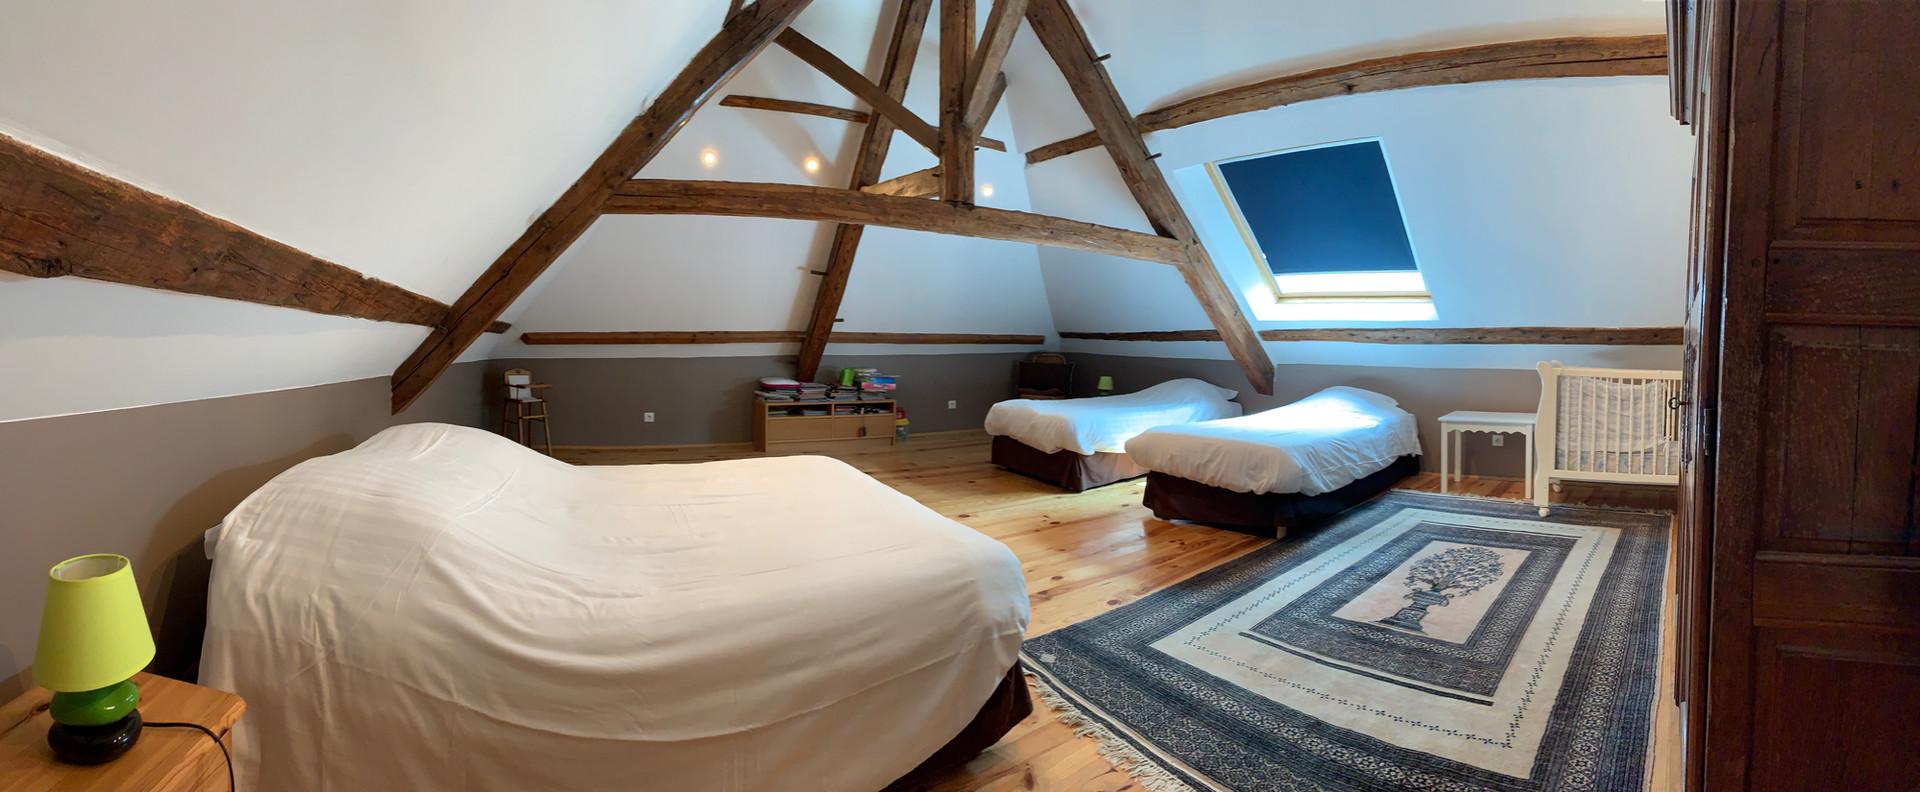 l'aiglon room